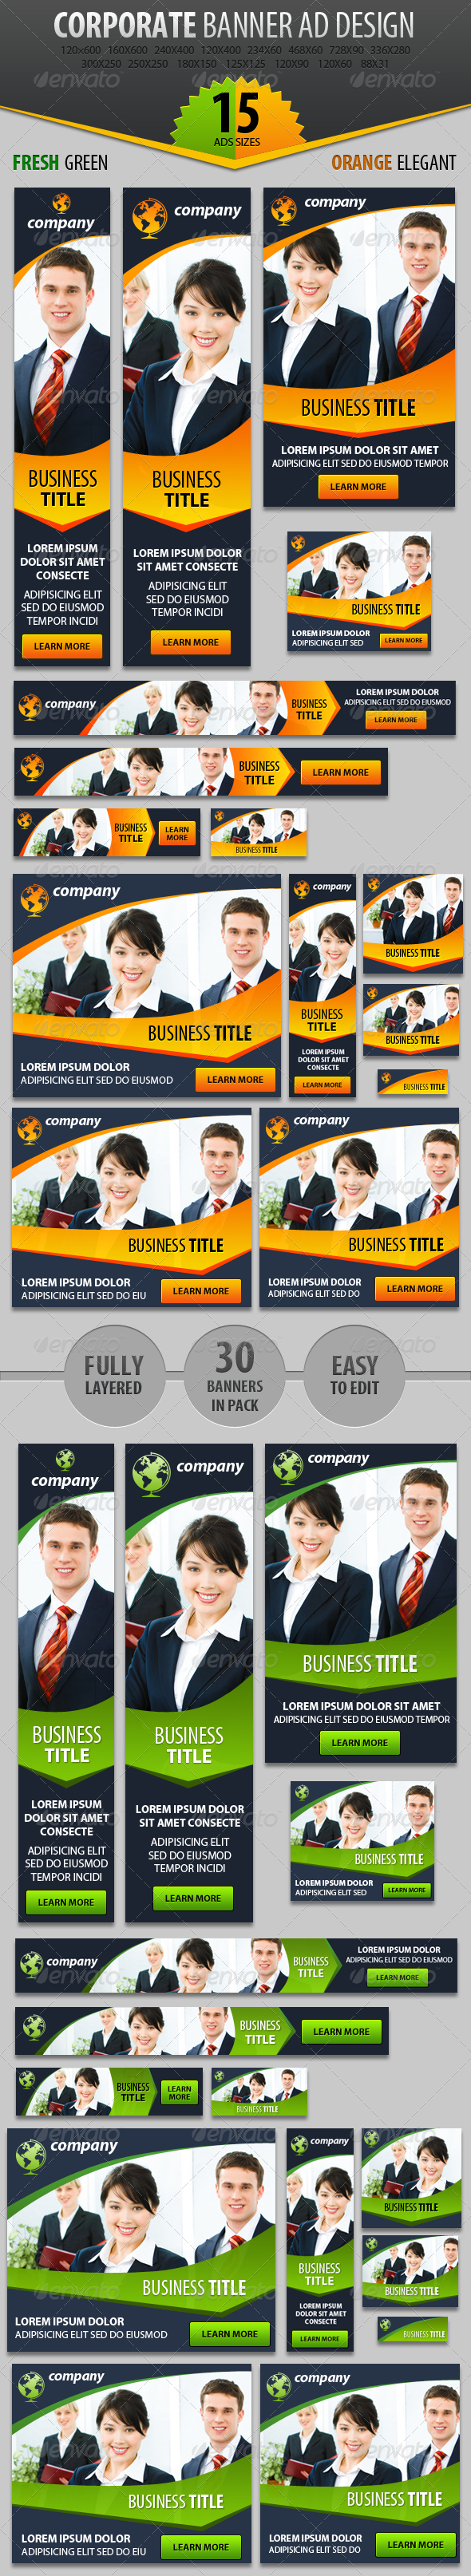 GraphicRiver Business Web Banner ad Design 5095342